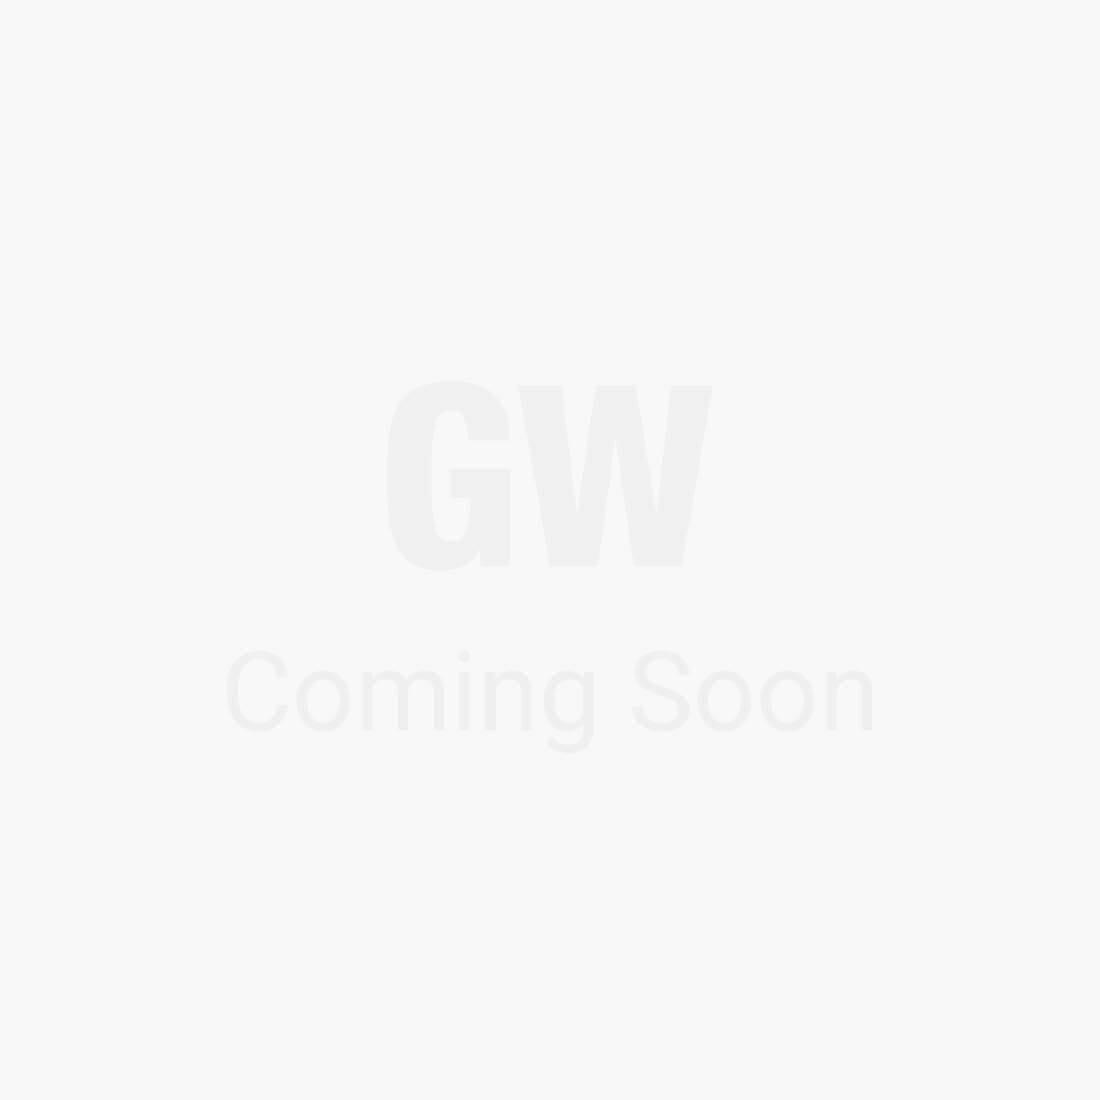 Tolv Figura Dining Chair